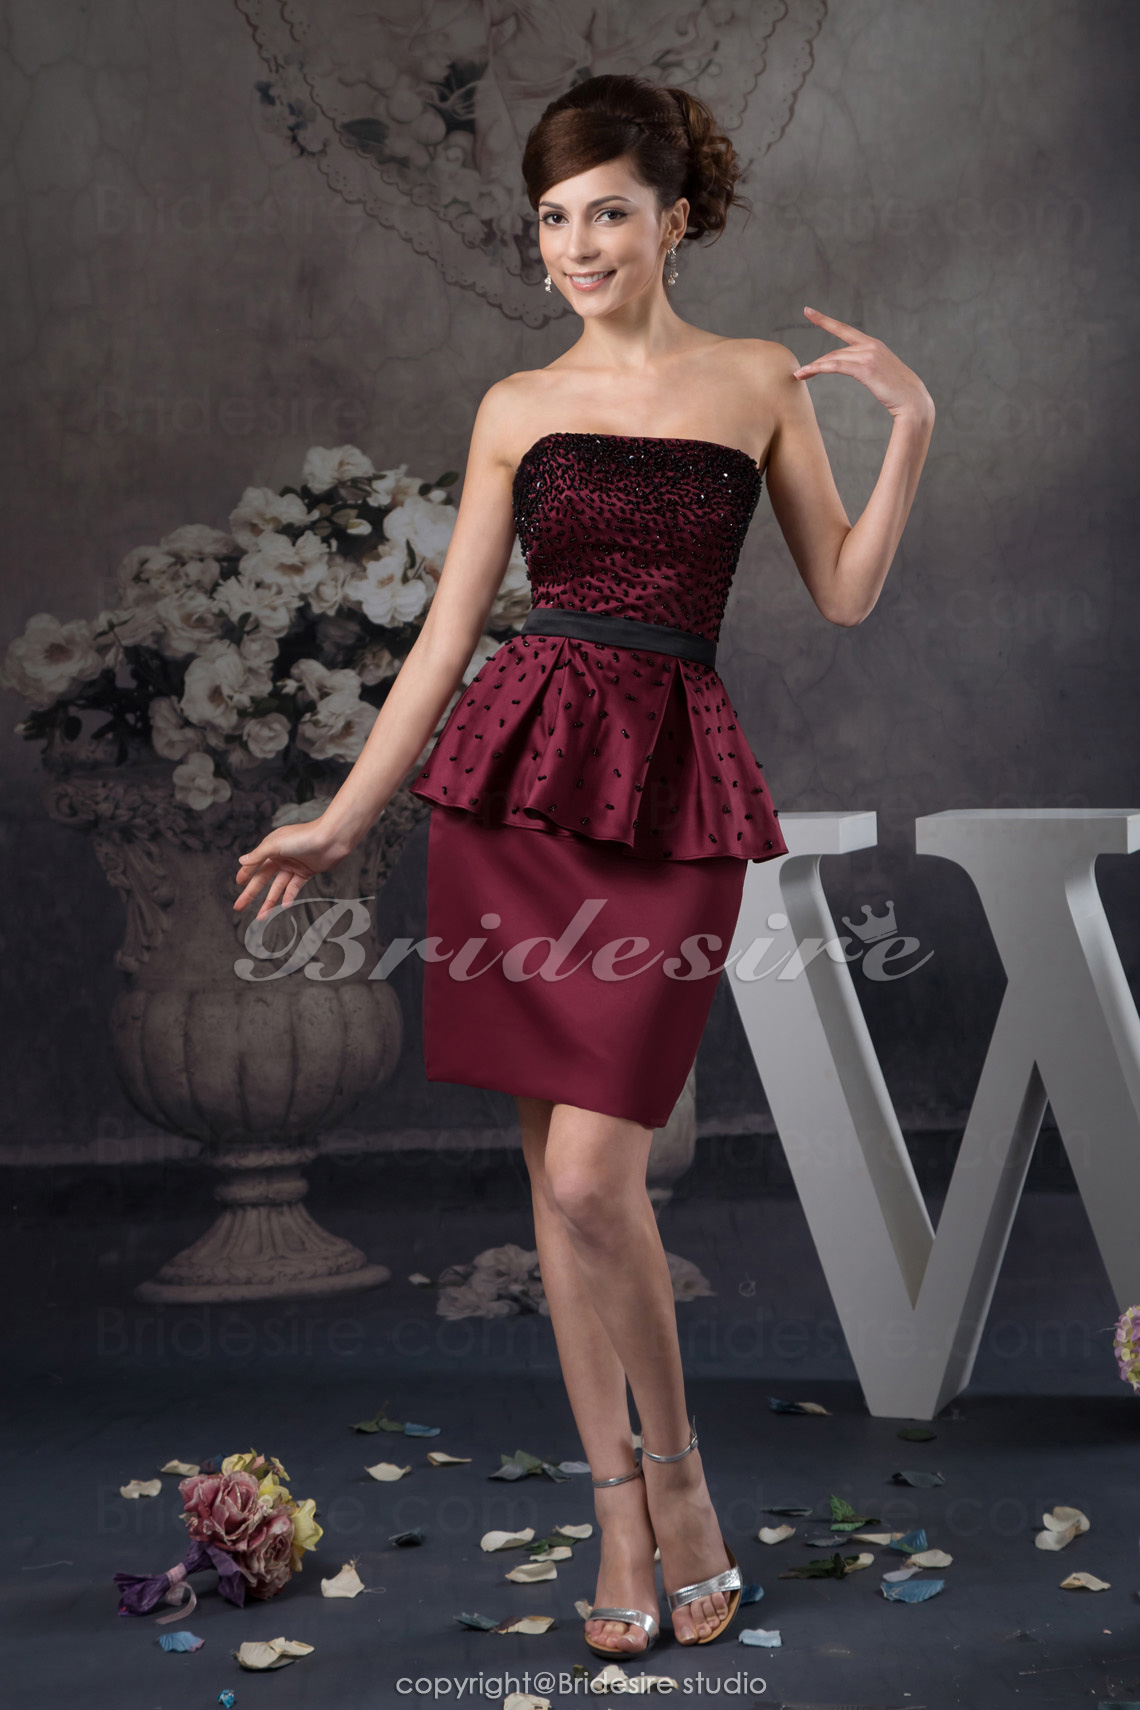 f2f38f1425d972 Bridesire - Schede Kolom Strapless Korte broek   Mini Mouwloos Satijn  Kleding  BD41021  - €77.06   Bridesire